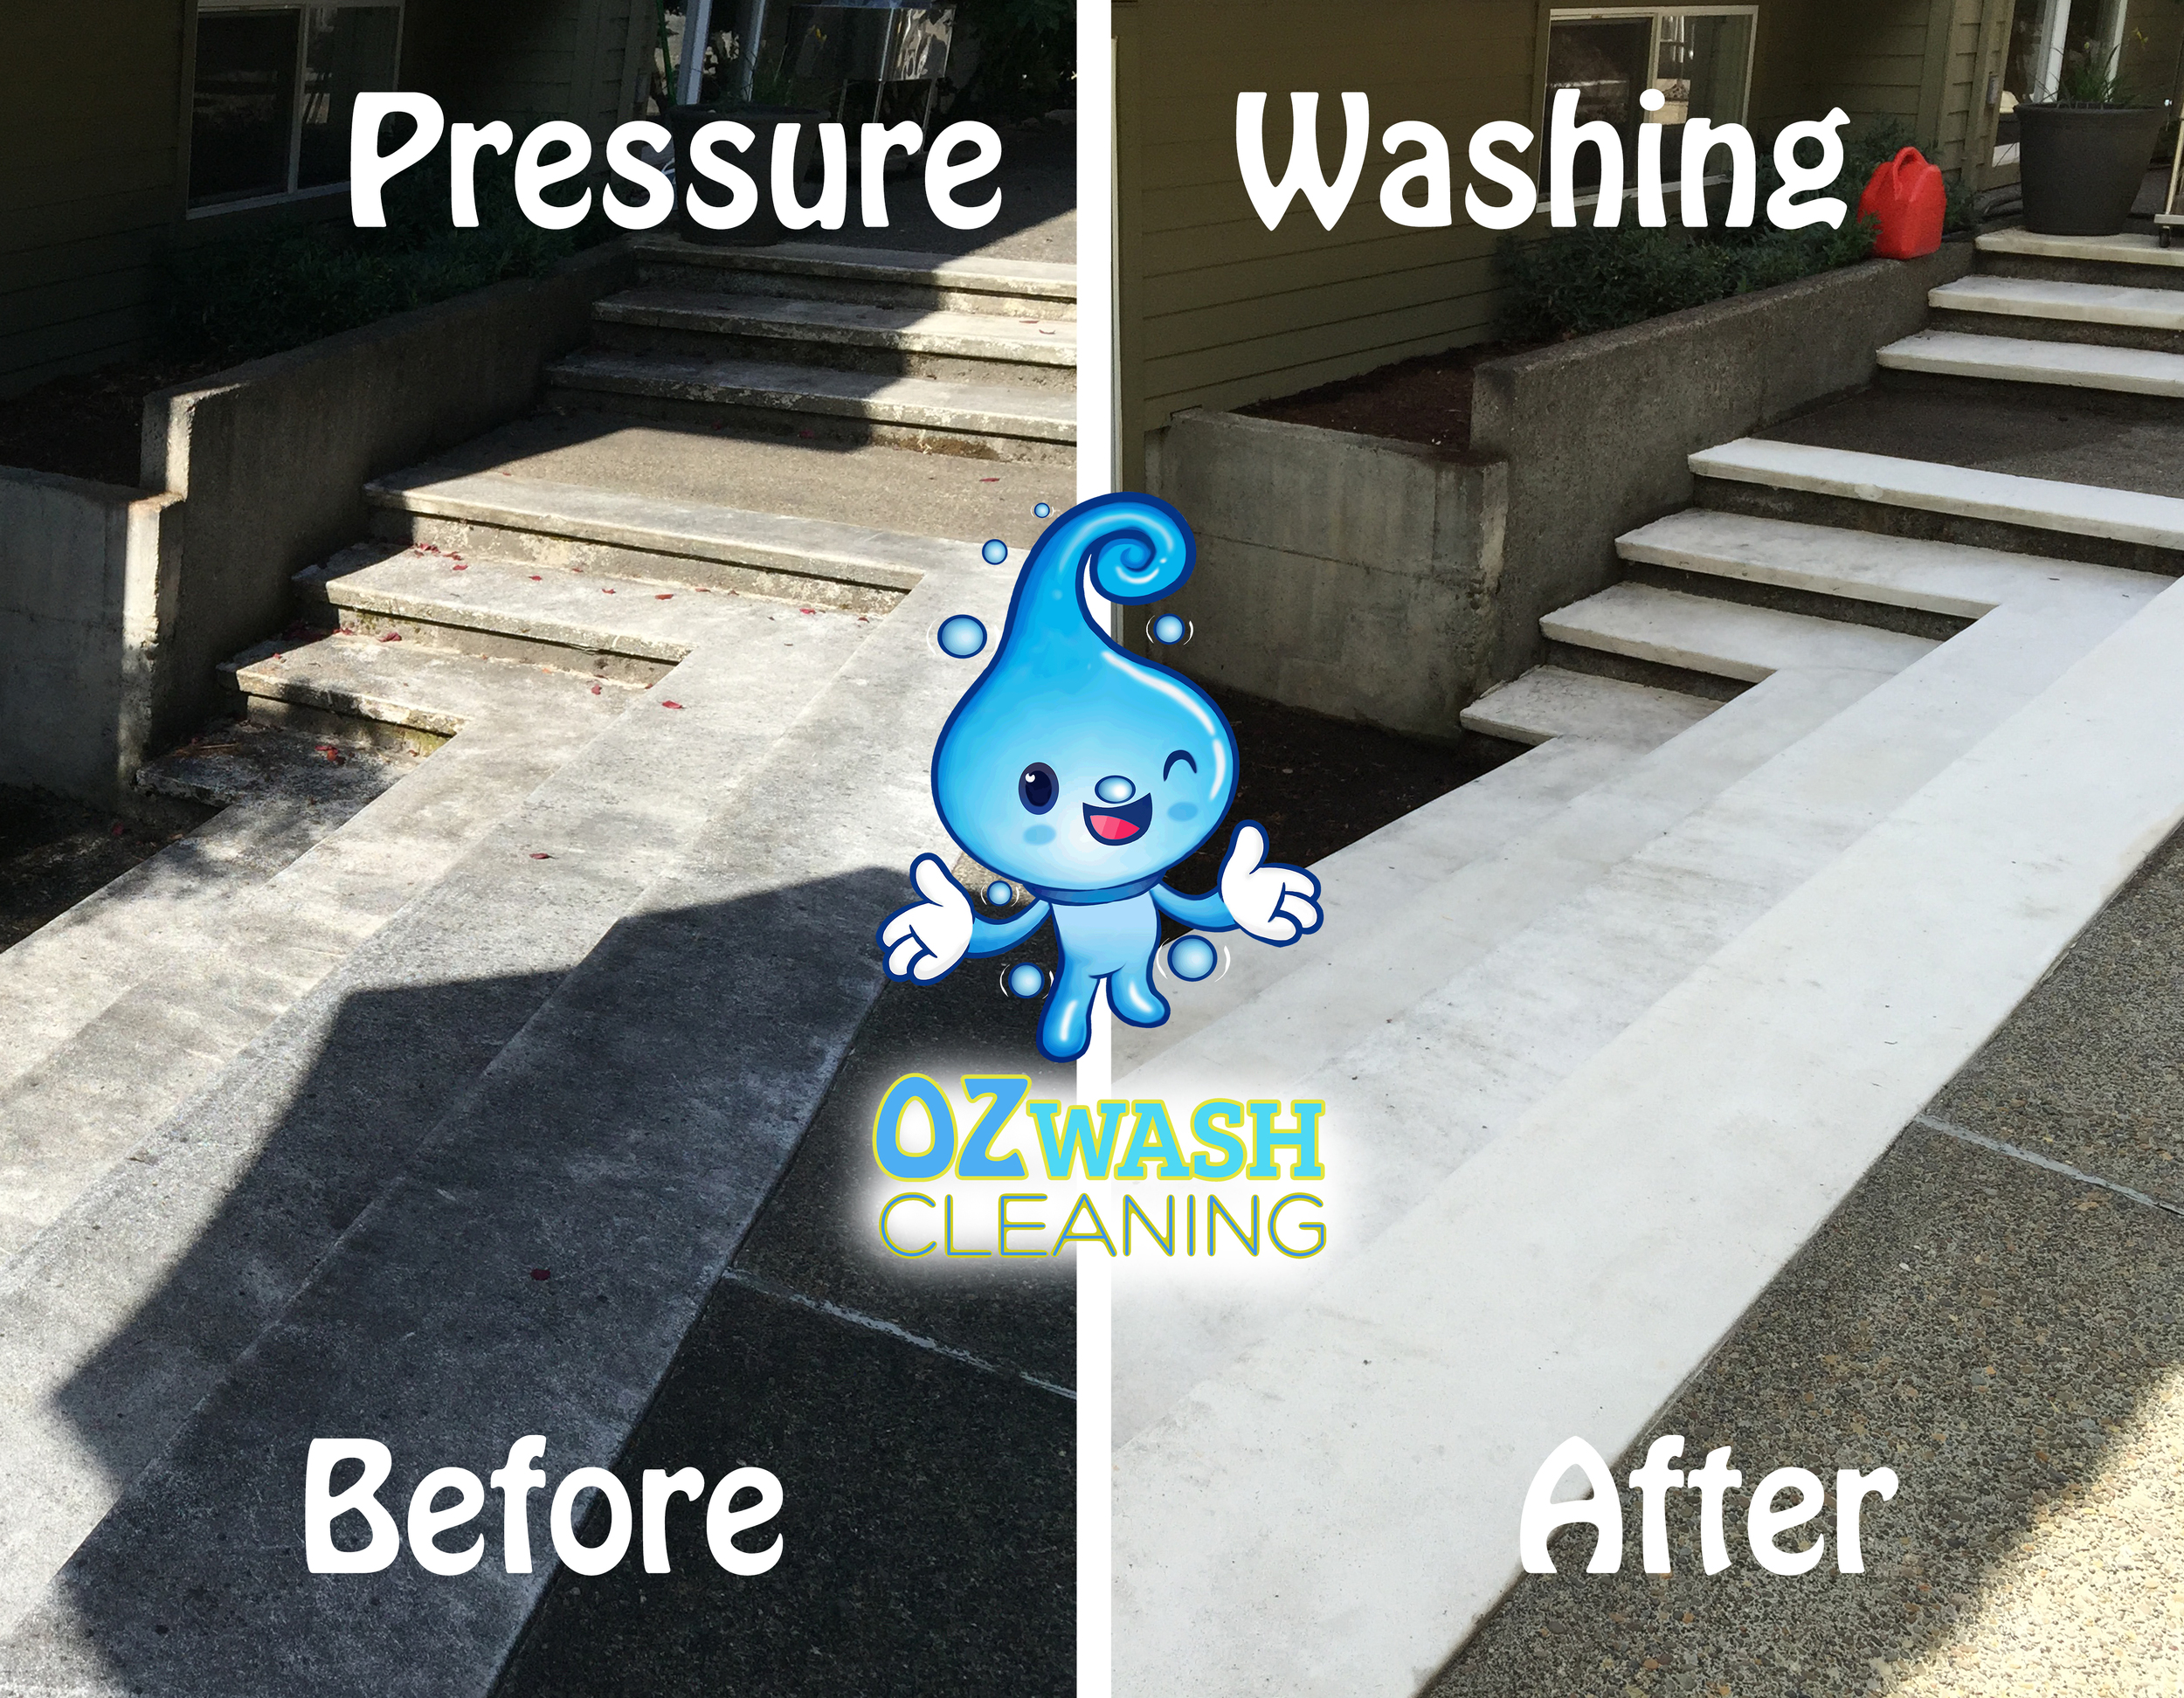 pressurewash1.jpg